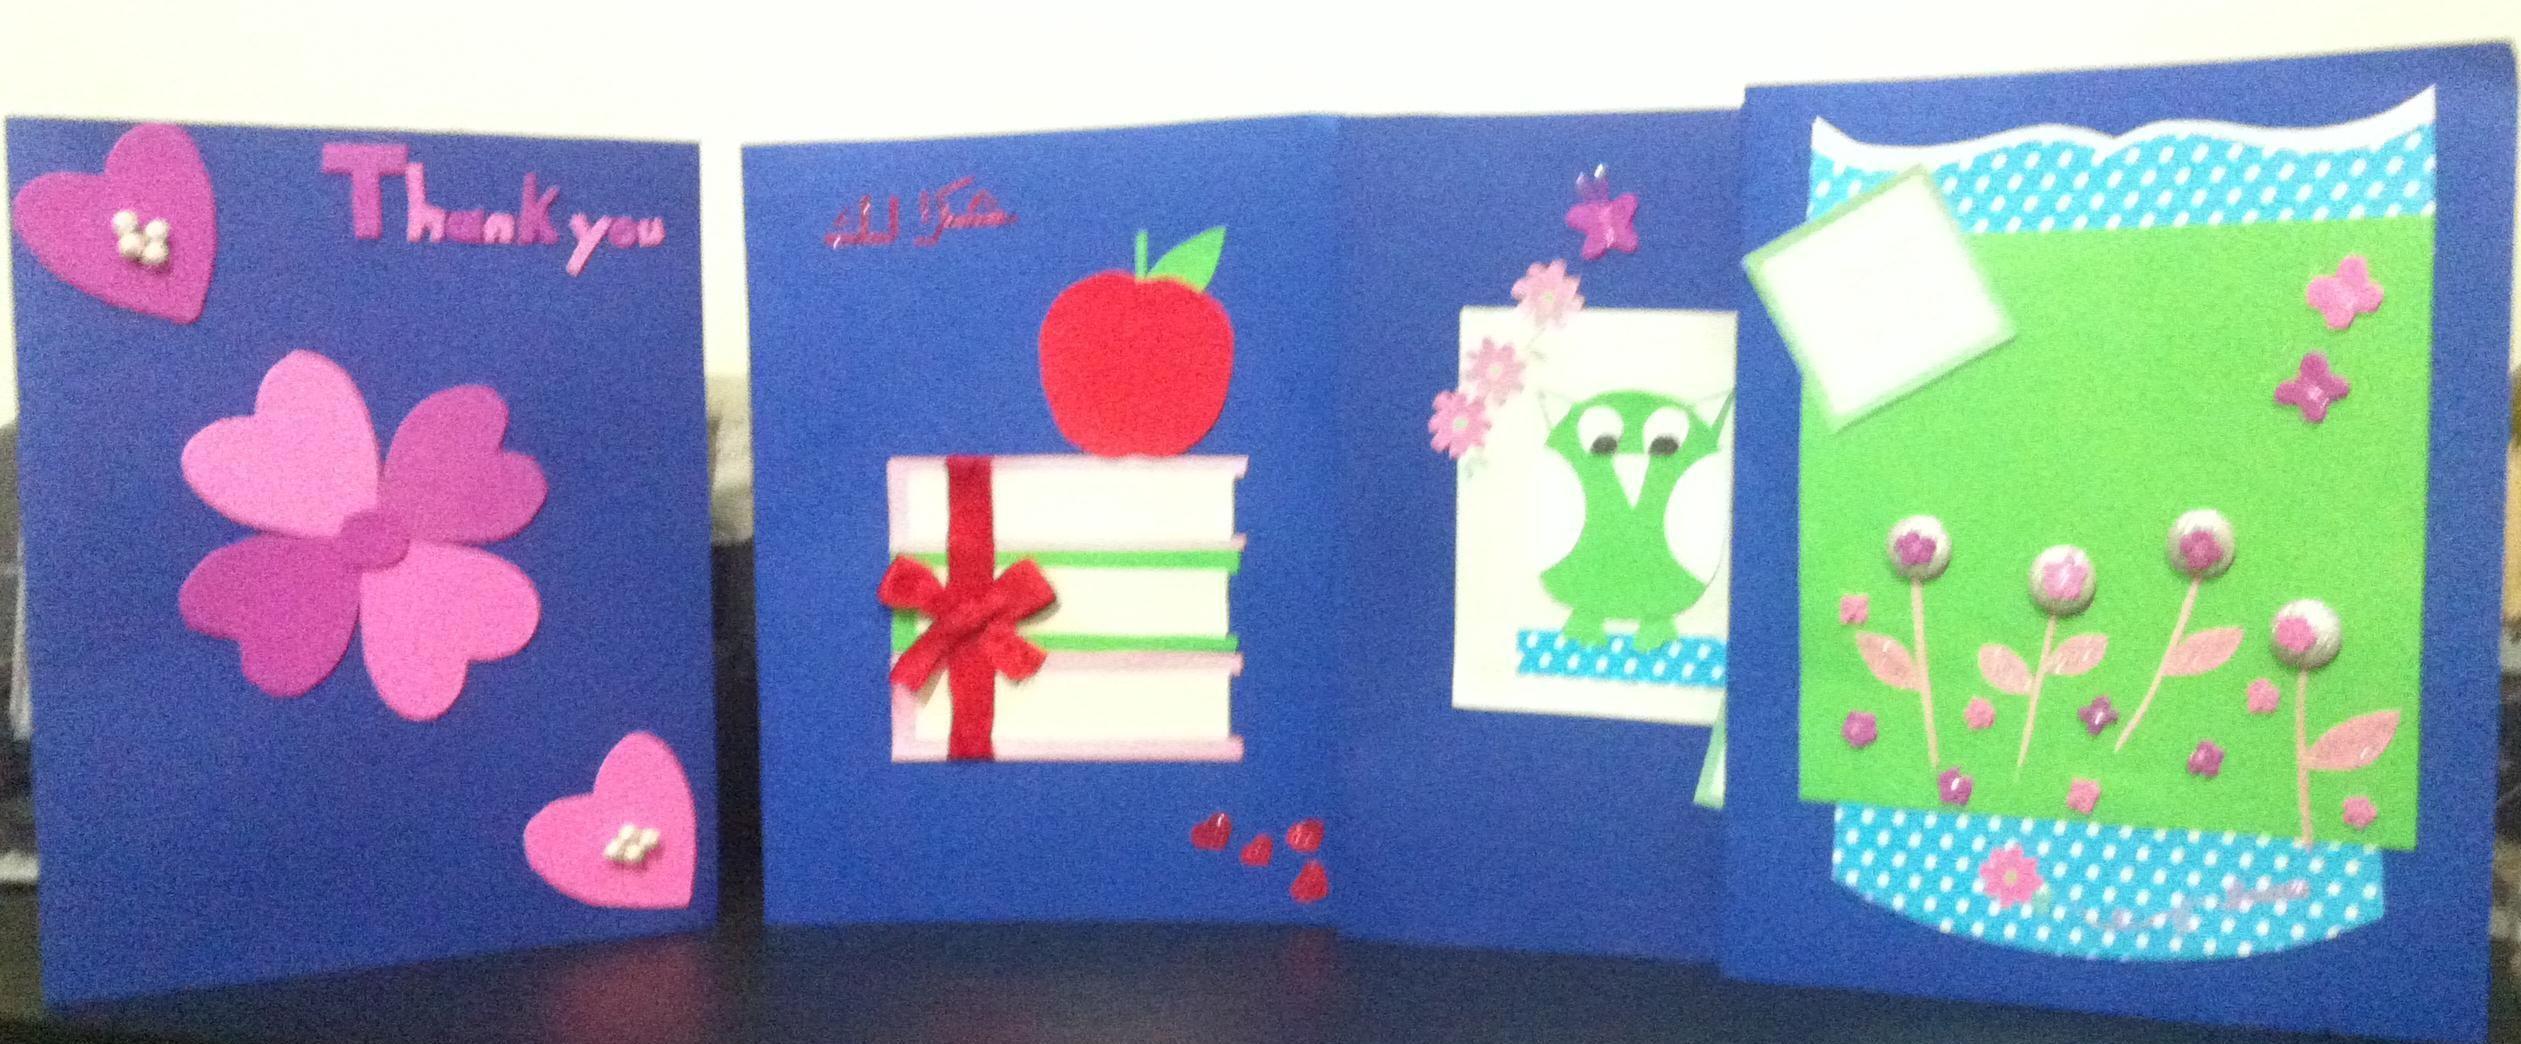 simple card for teachers day createdmy lanloun